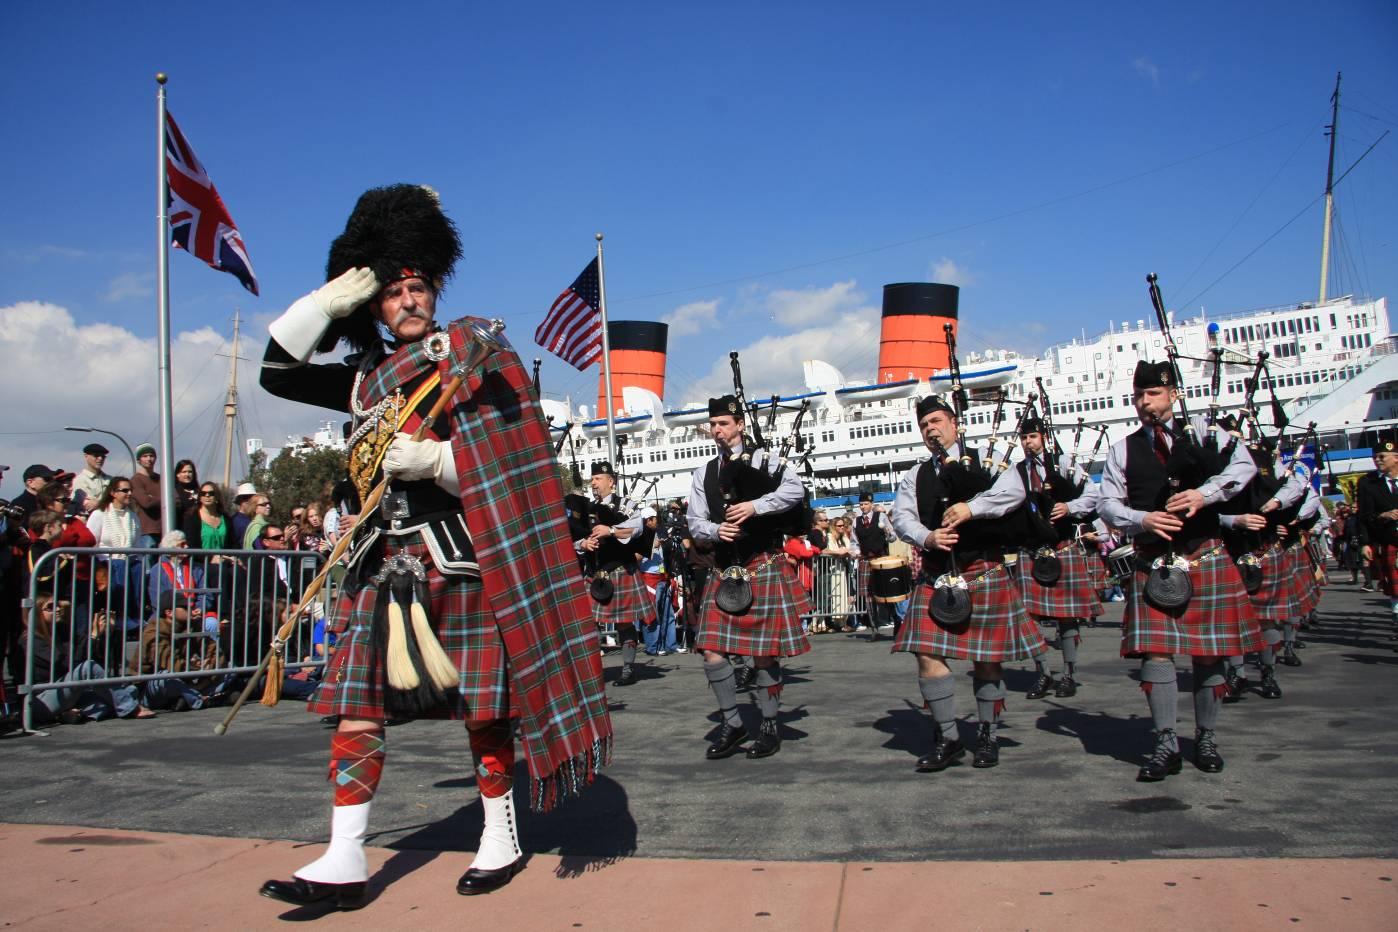 ScotsFestival & International Highland Games